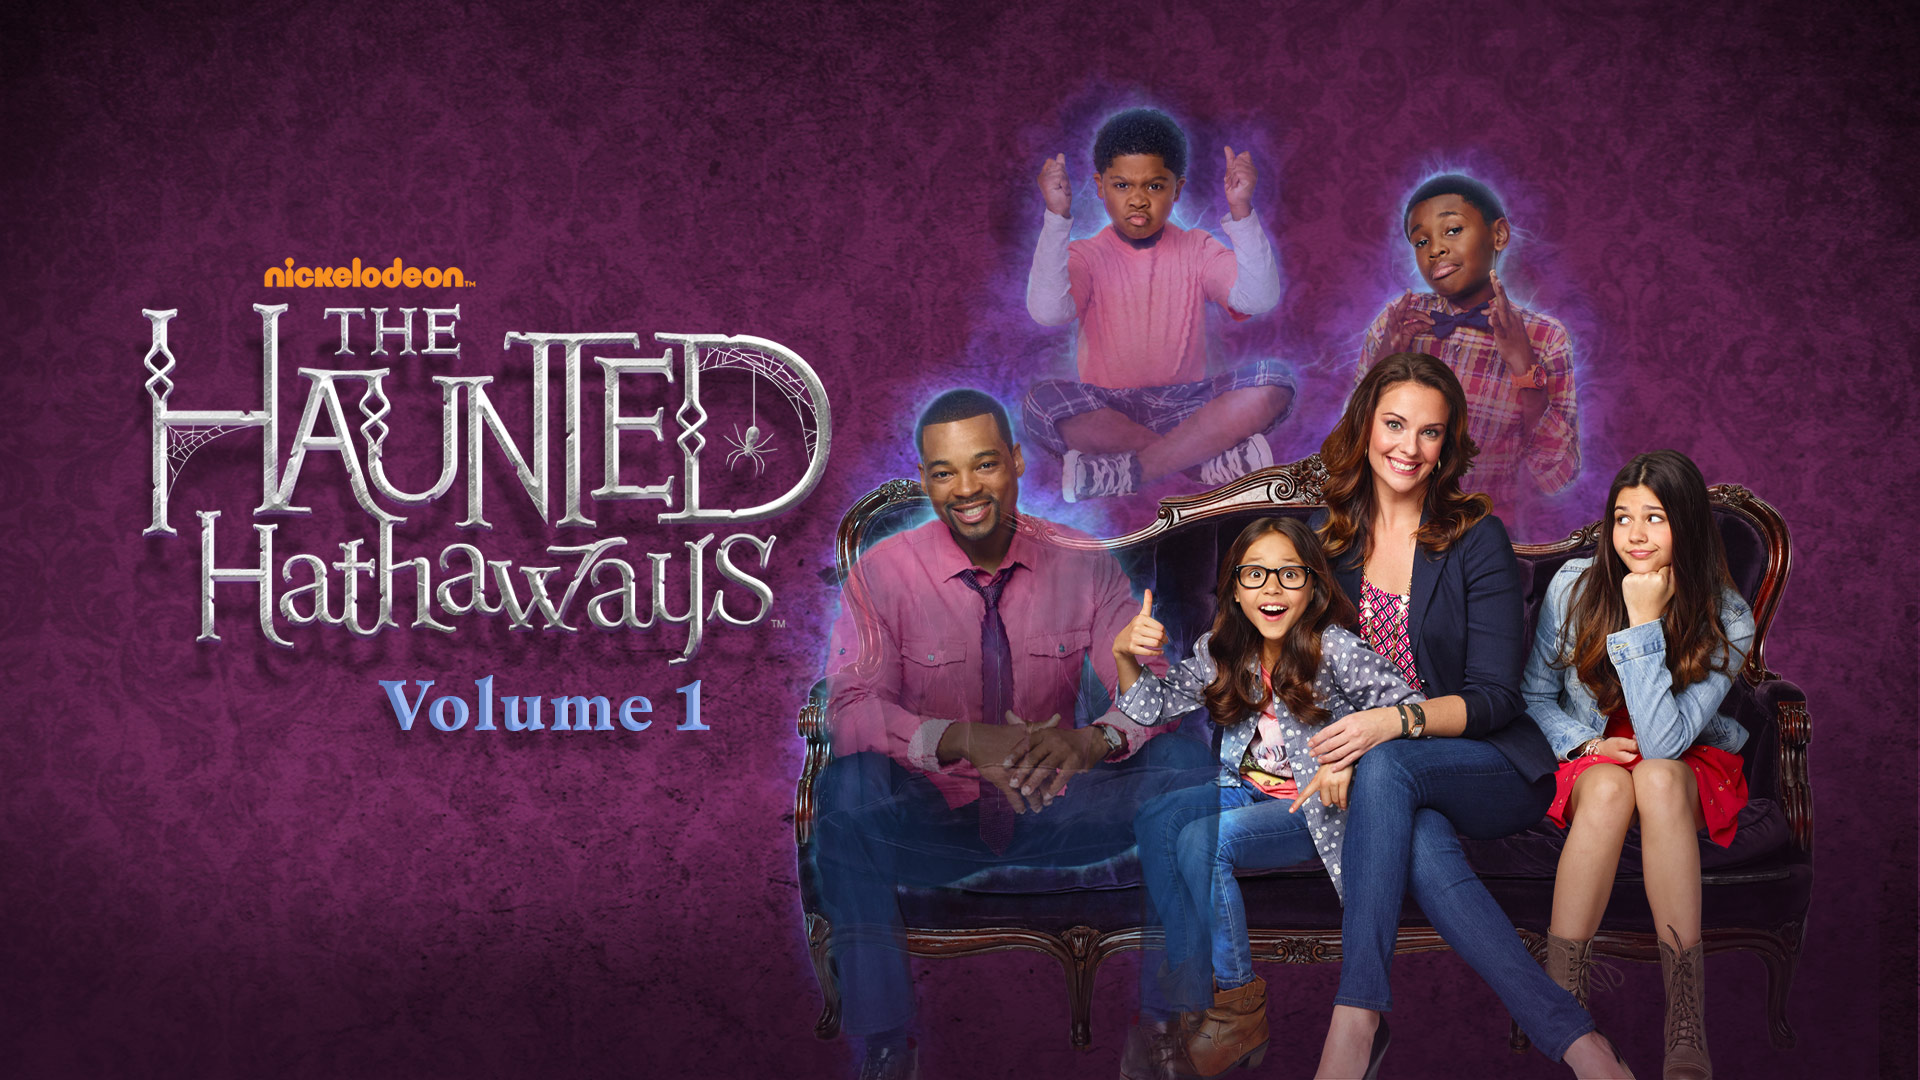 The Haunted Hathaways Volume 1